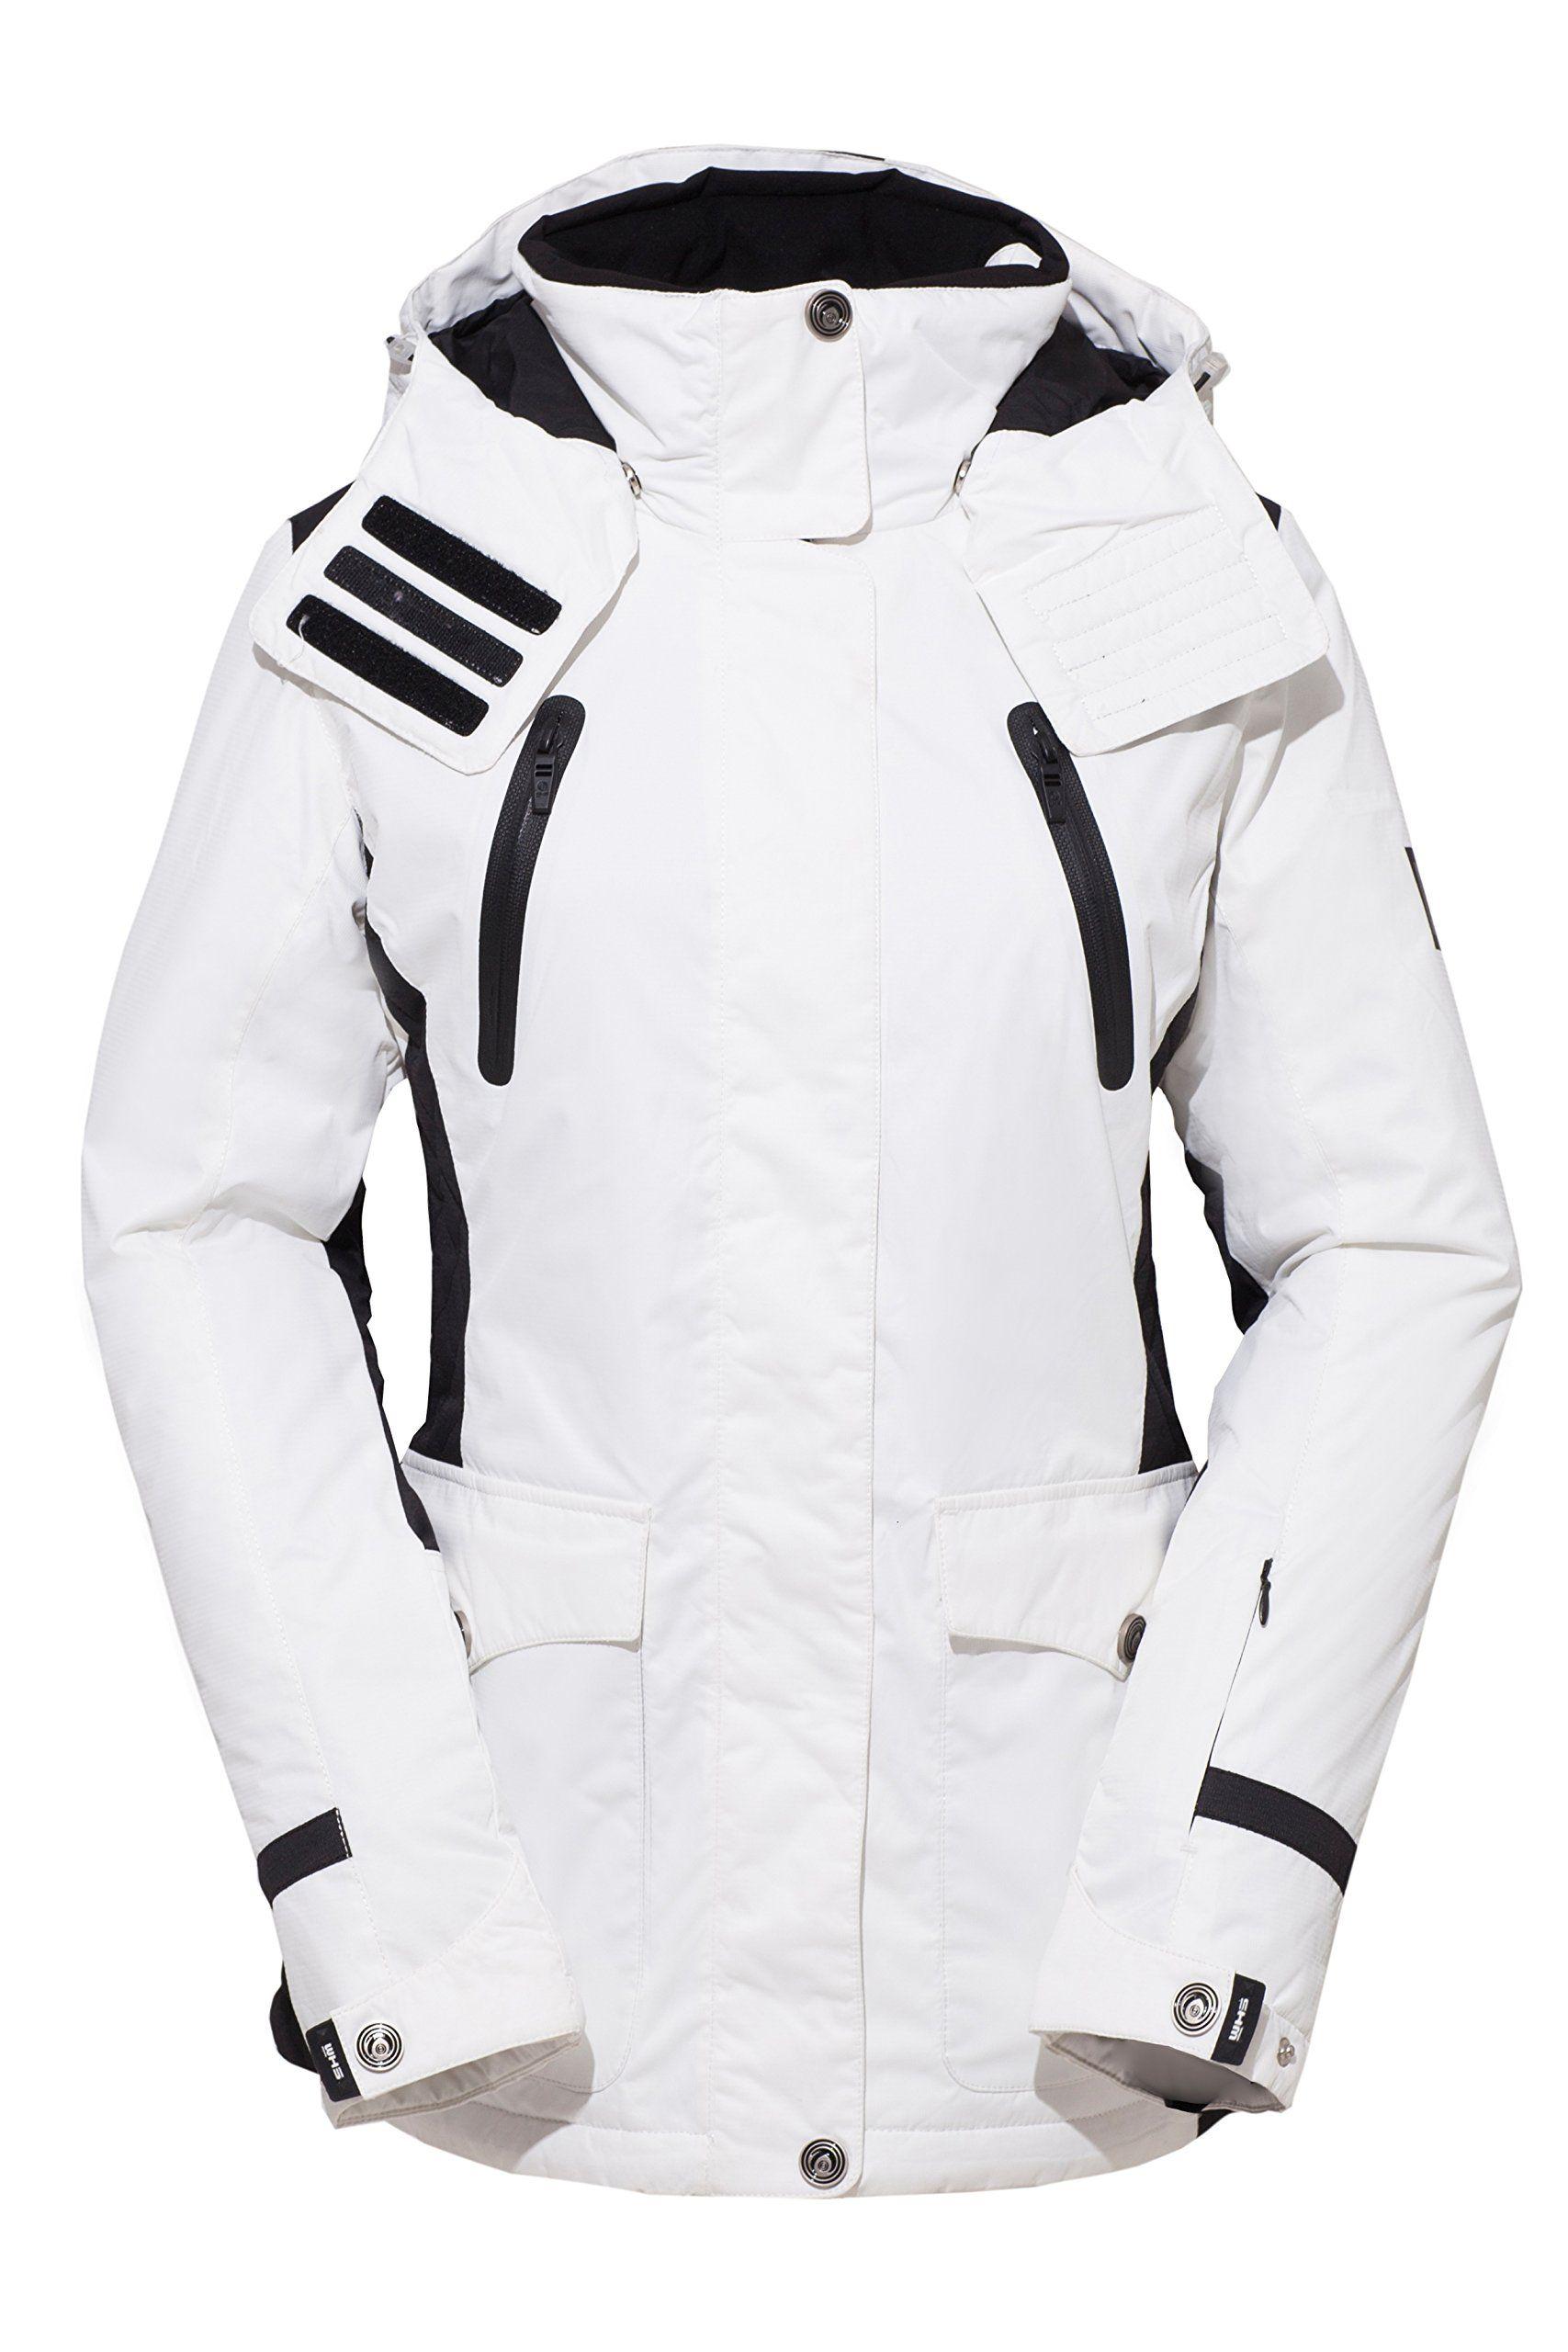 Amazon Women White Full Zip Outdoor Sport Jacket